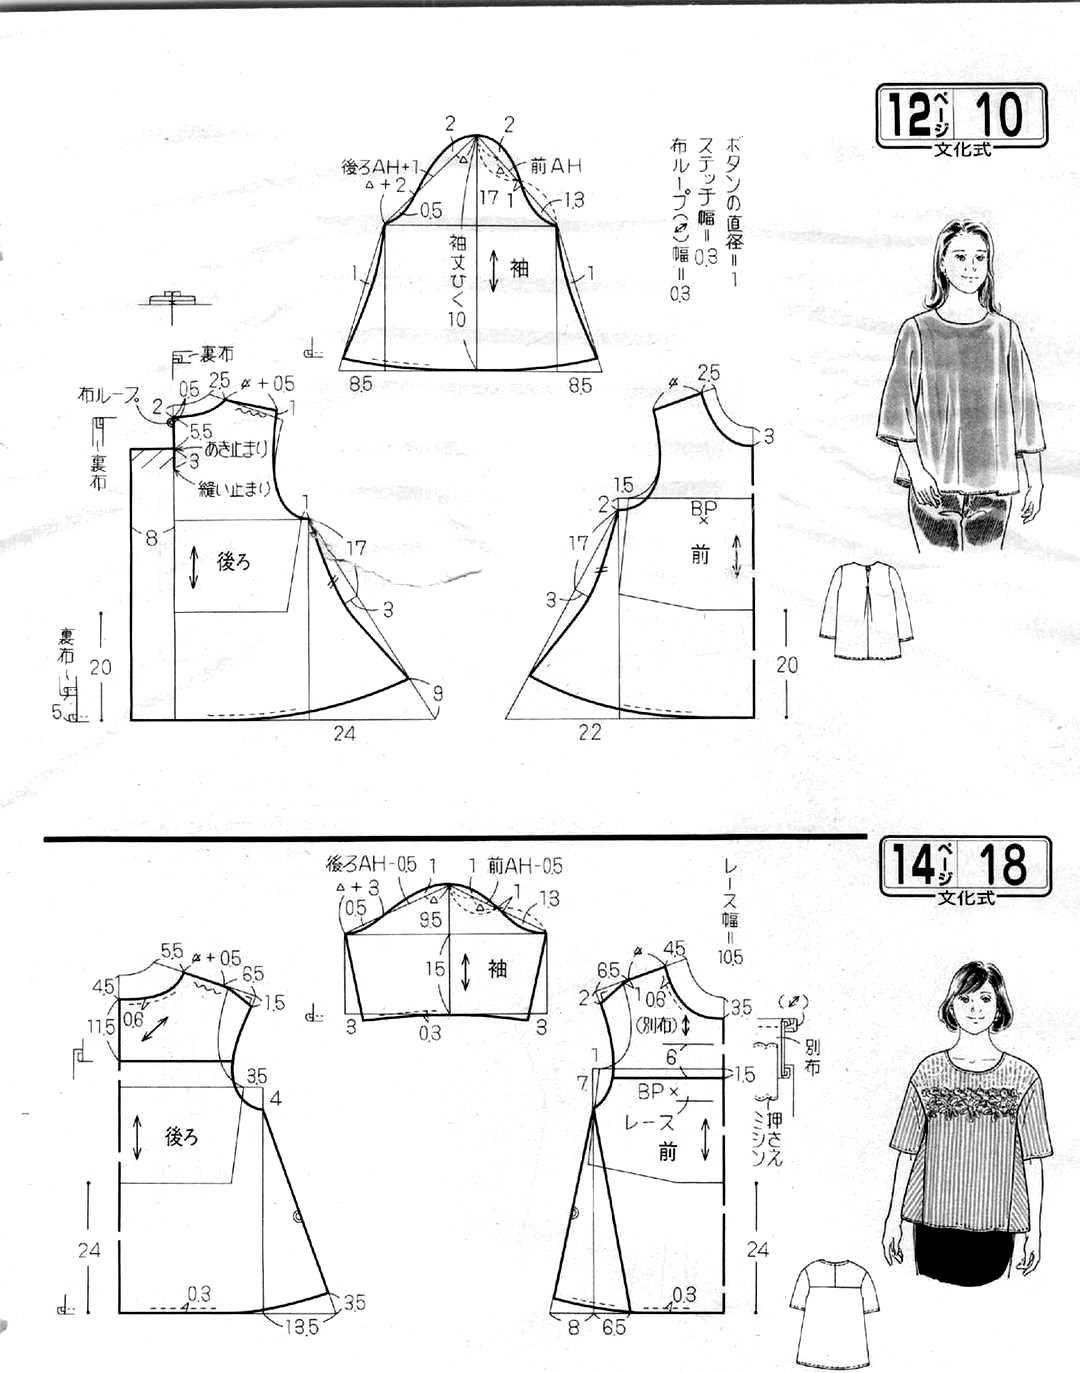 Pin de C T en 01 dess patterns | Pinterest | Blusas, Patrones y Costura